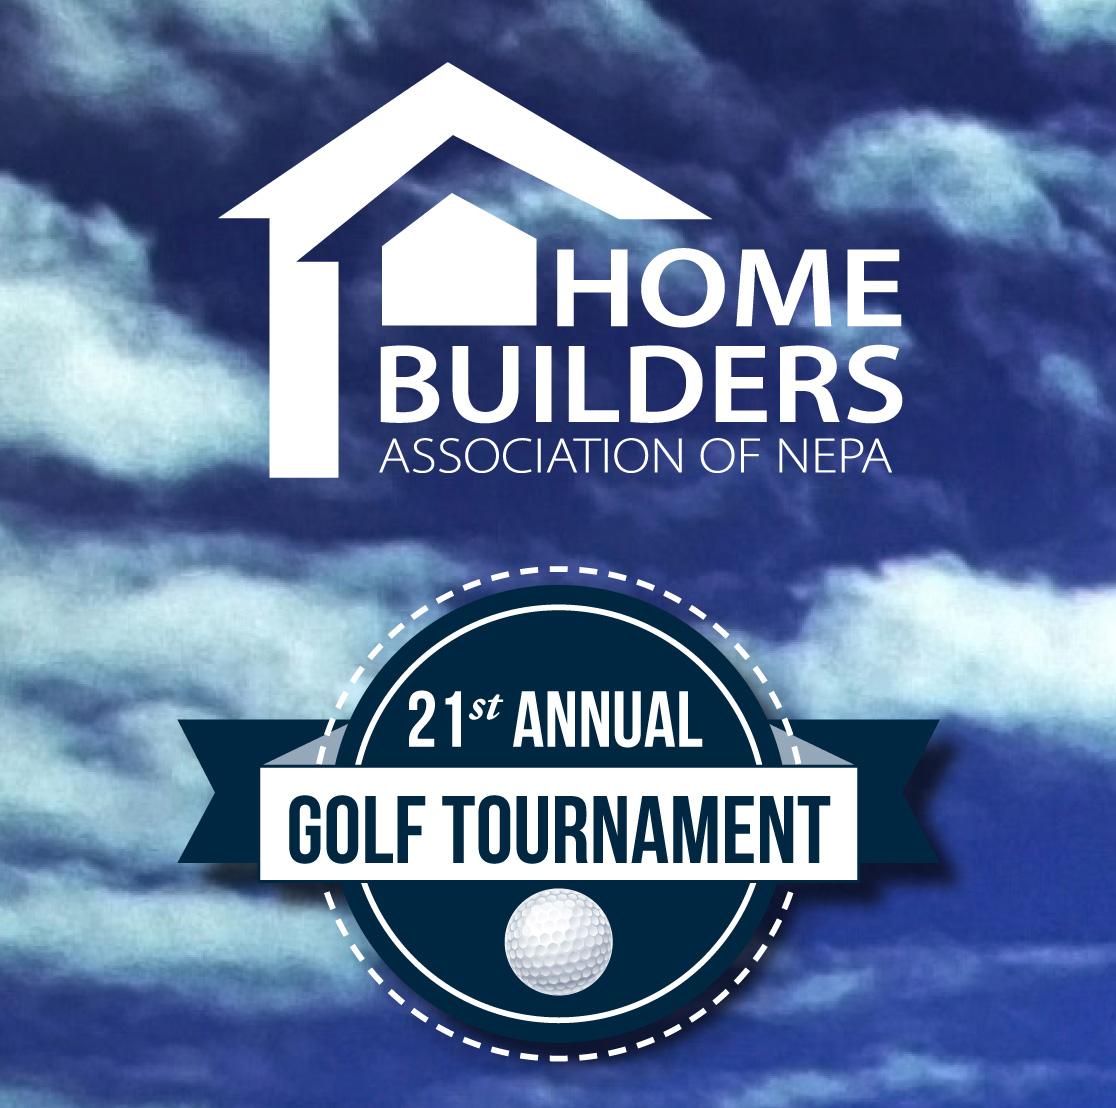 Home Builders Association 21st Annual Golf Tournament